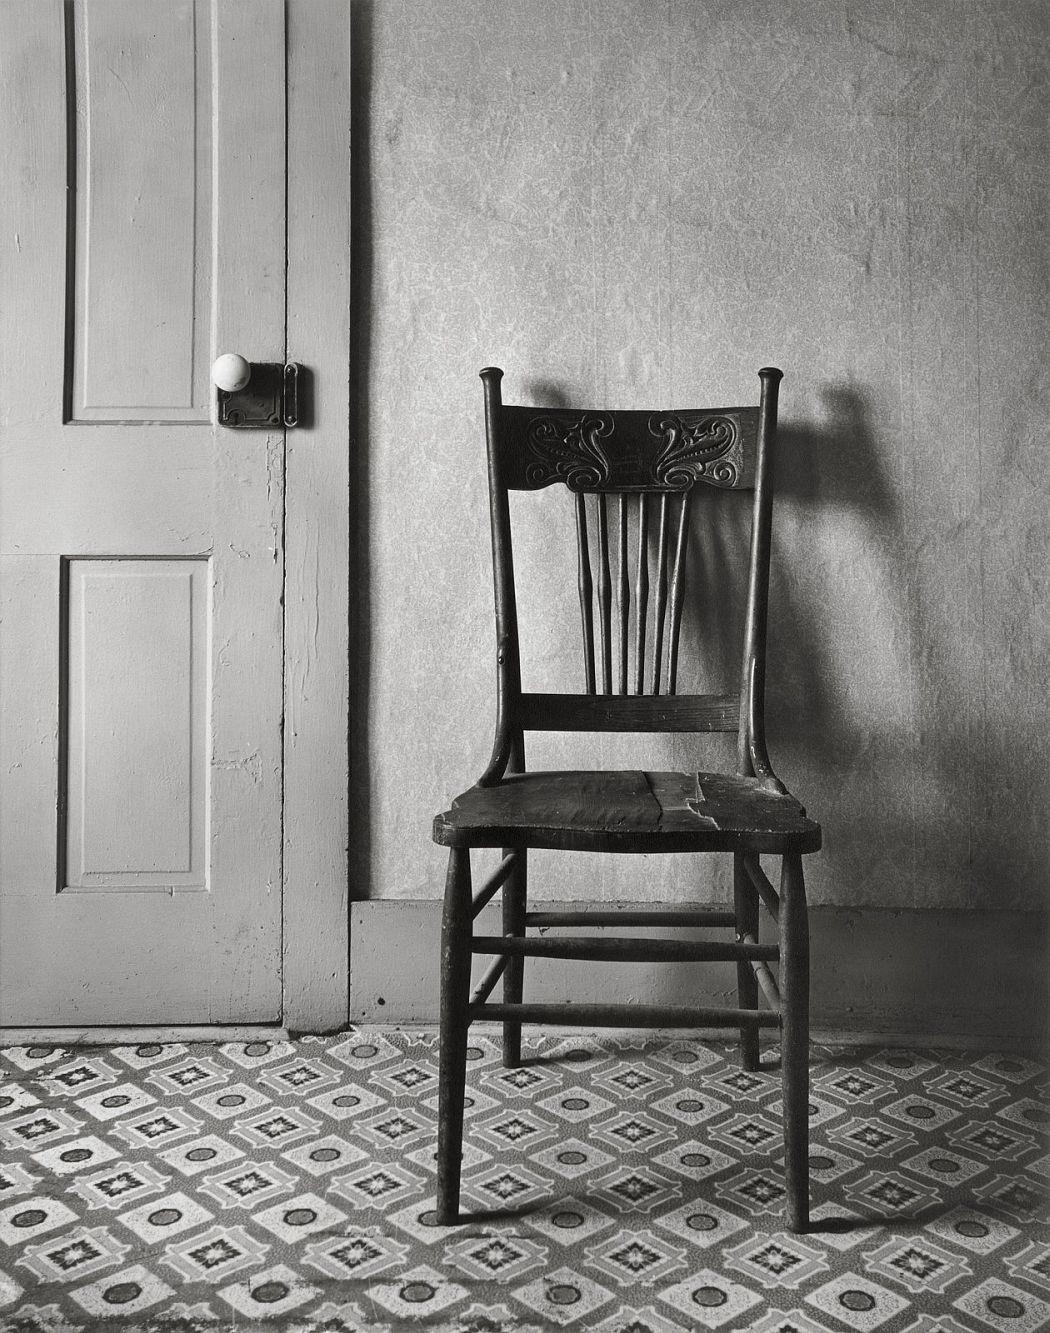 Wright Morris, The Home Place, Norfolk, Nebraska, 1947 © Estate of Wright Morris